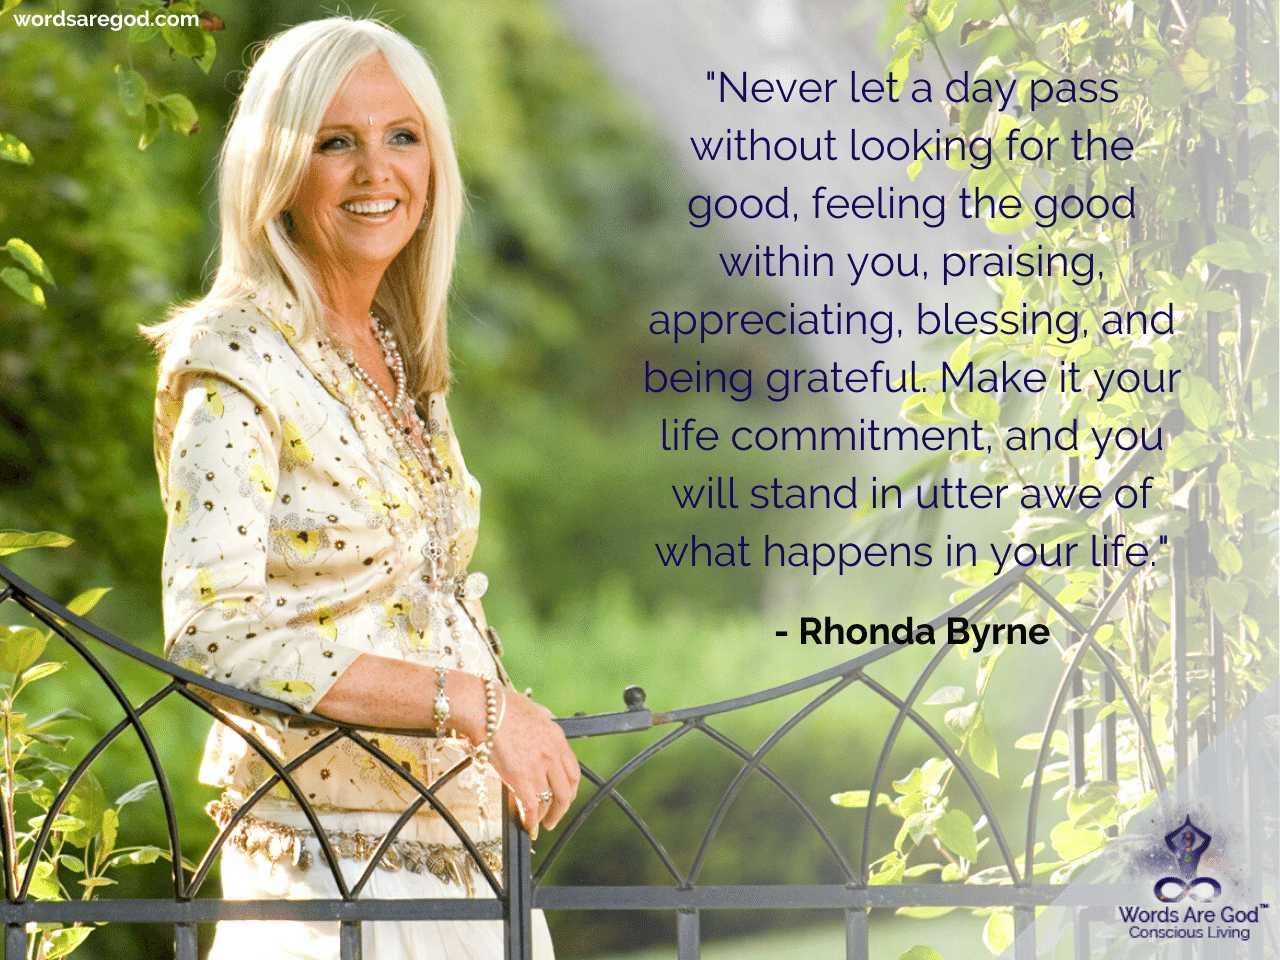 Rhonda Byrne Best Quotes